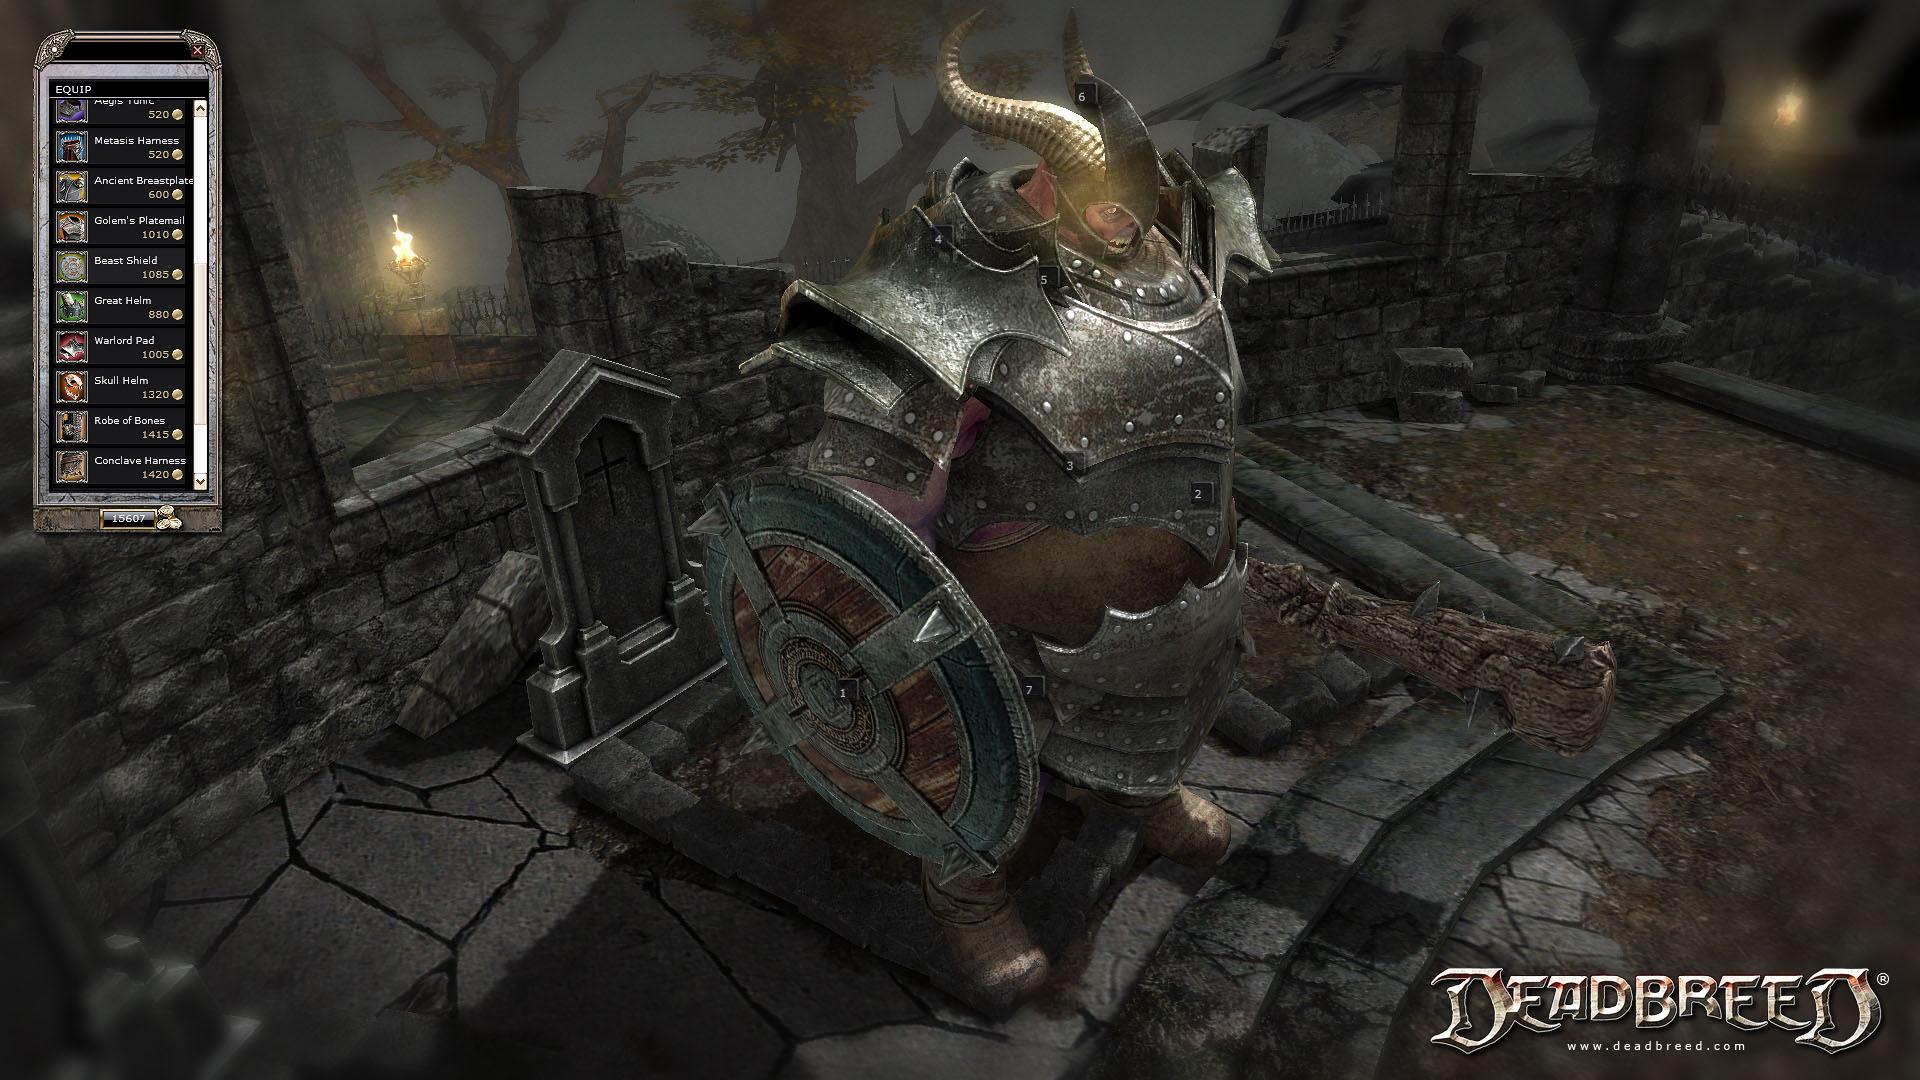 Deadbreed_Armor